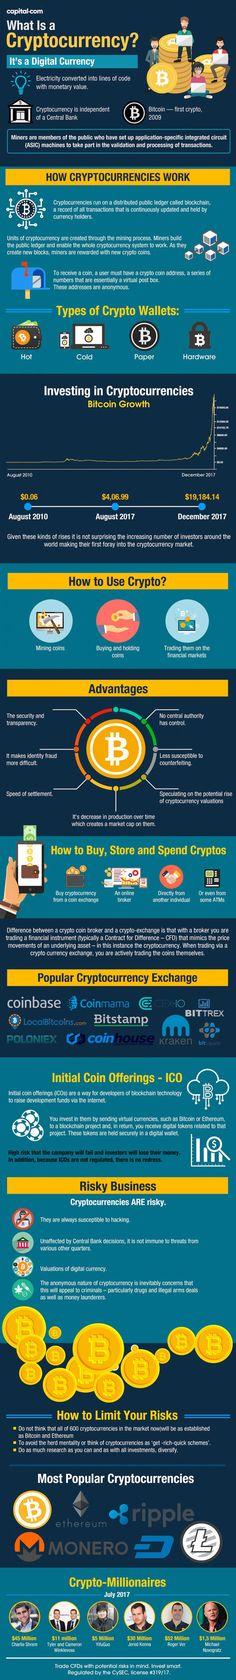 câștigurile bitcoin pasive